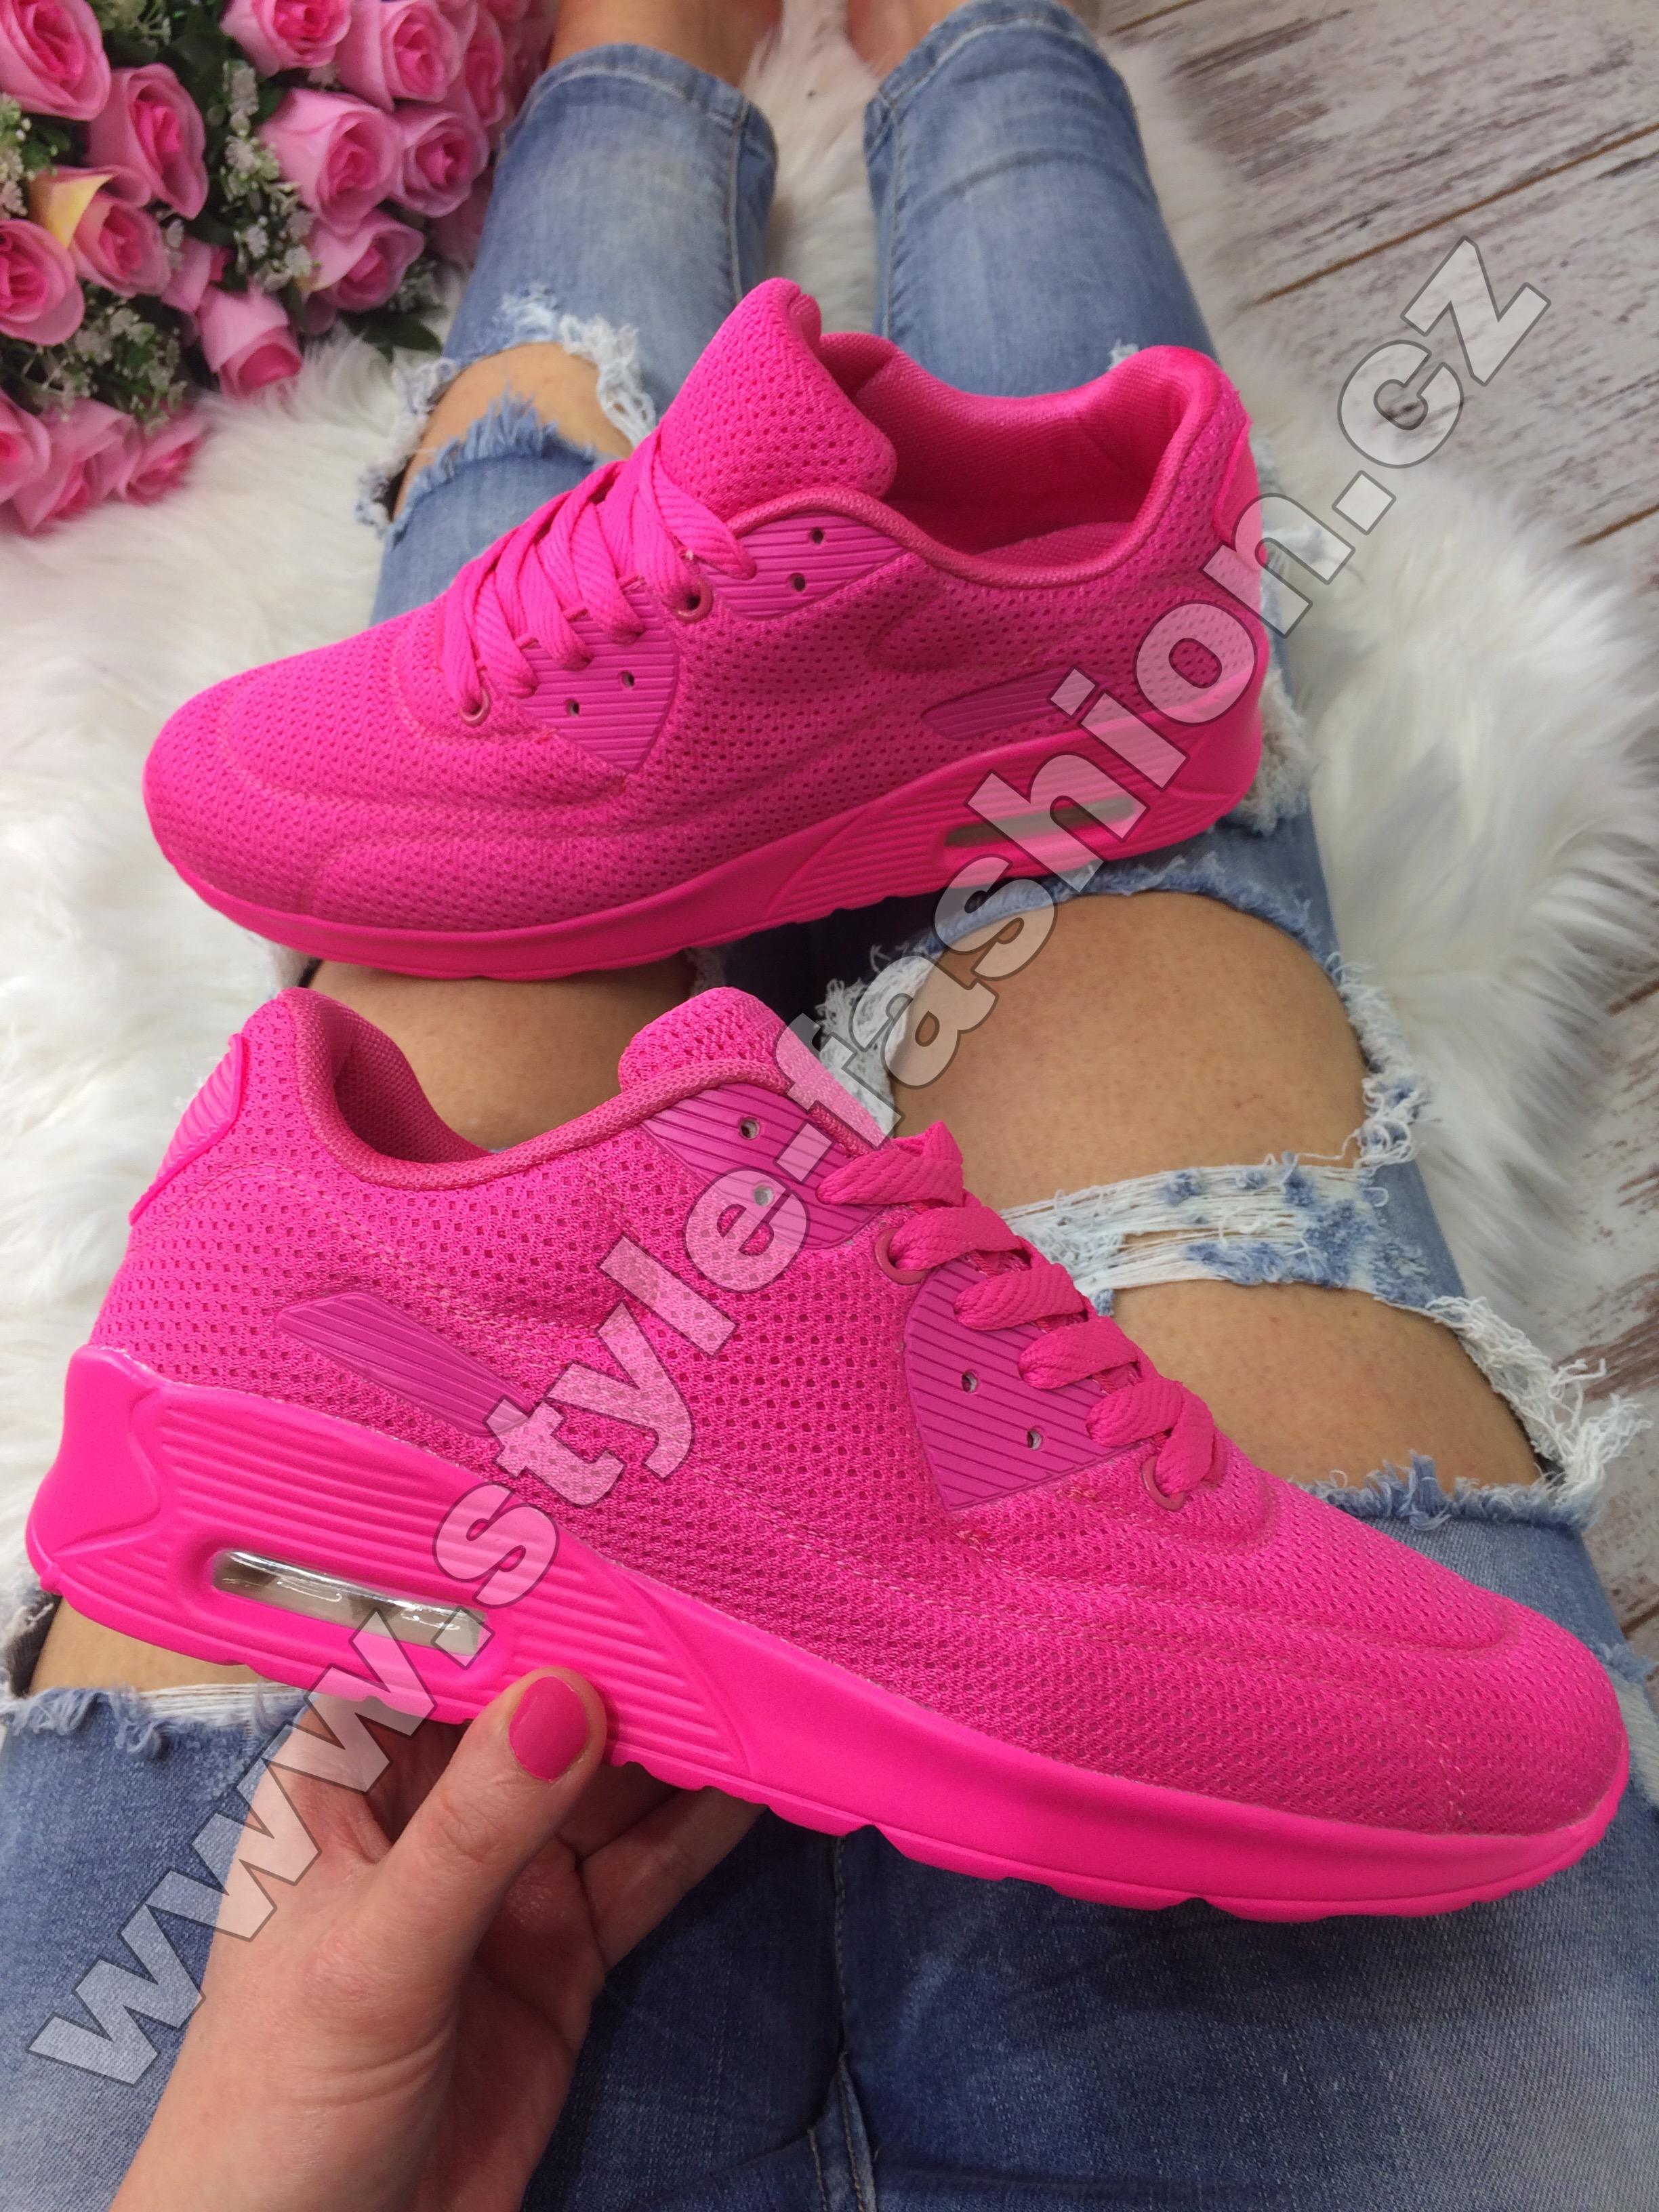 8227056b31 Neonové tenisky růžové